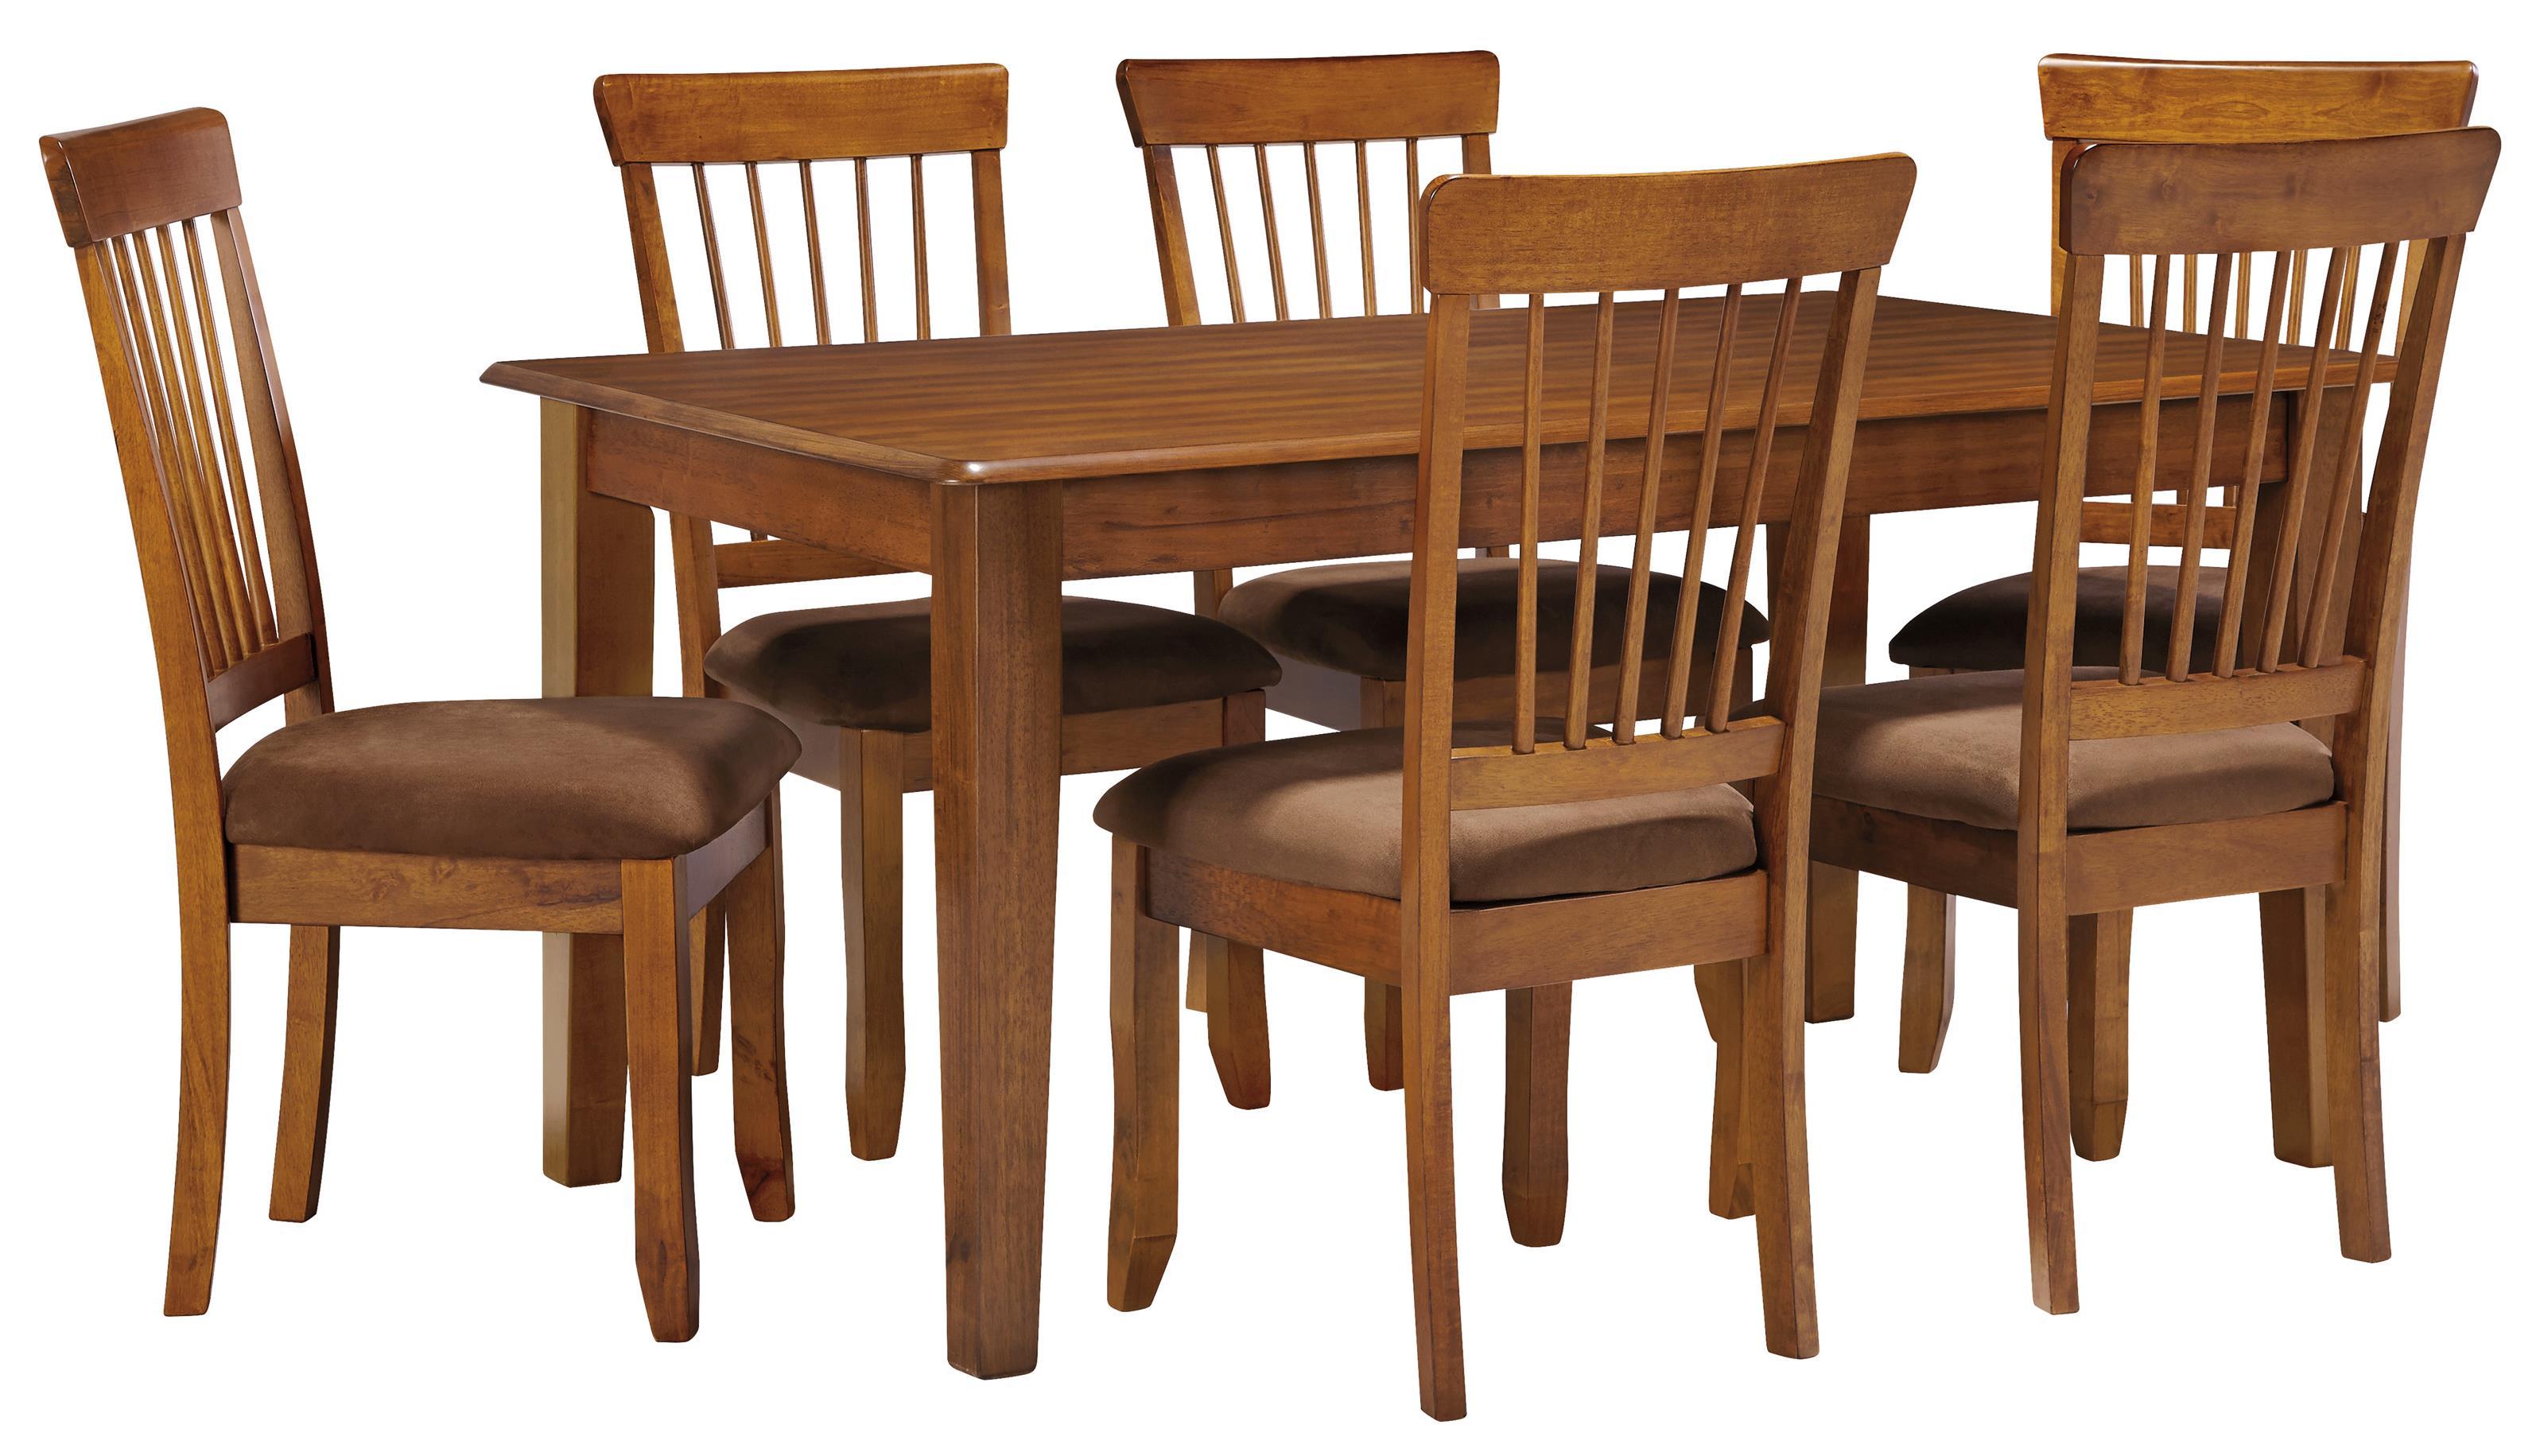 Ashley Furniture Berringer 7 Piece 36x60 Table U0026 Chair Set ...